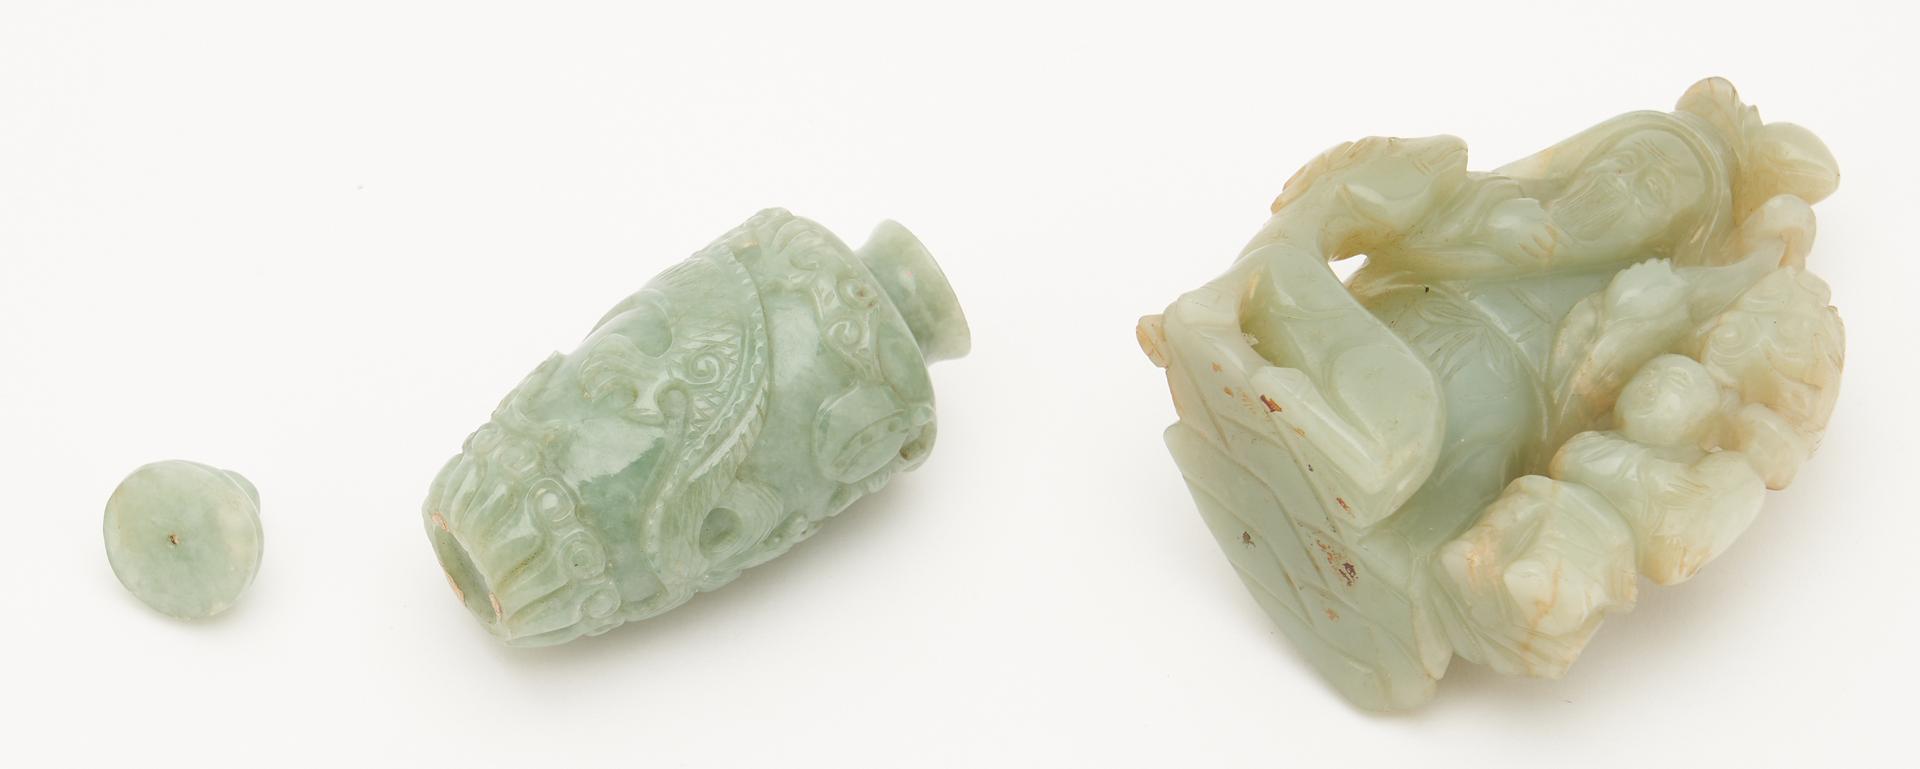 Lot 405: 2 Chinese Celadon Jade Items, Immortal & Snuff Bottle